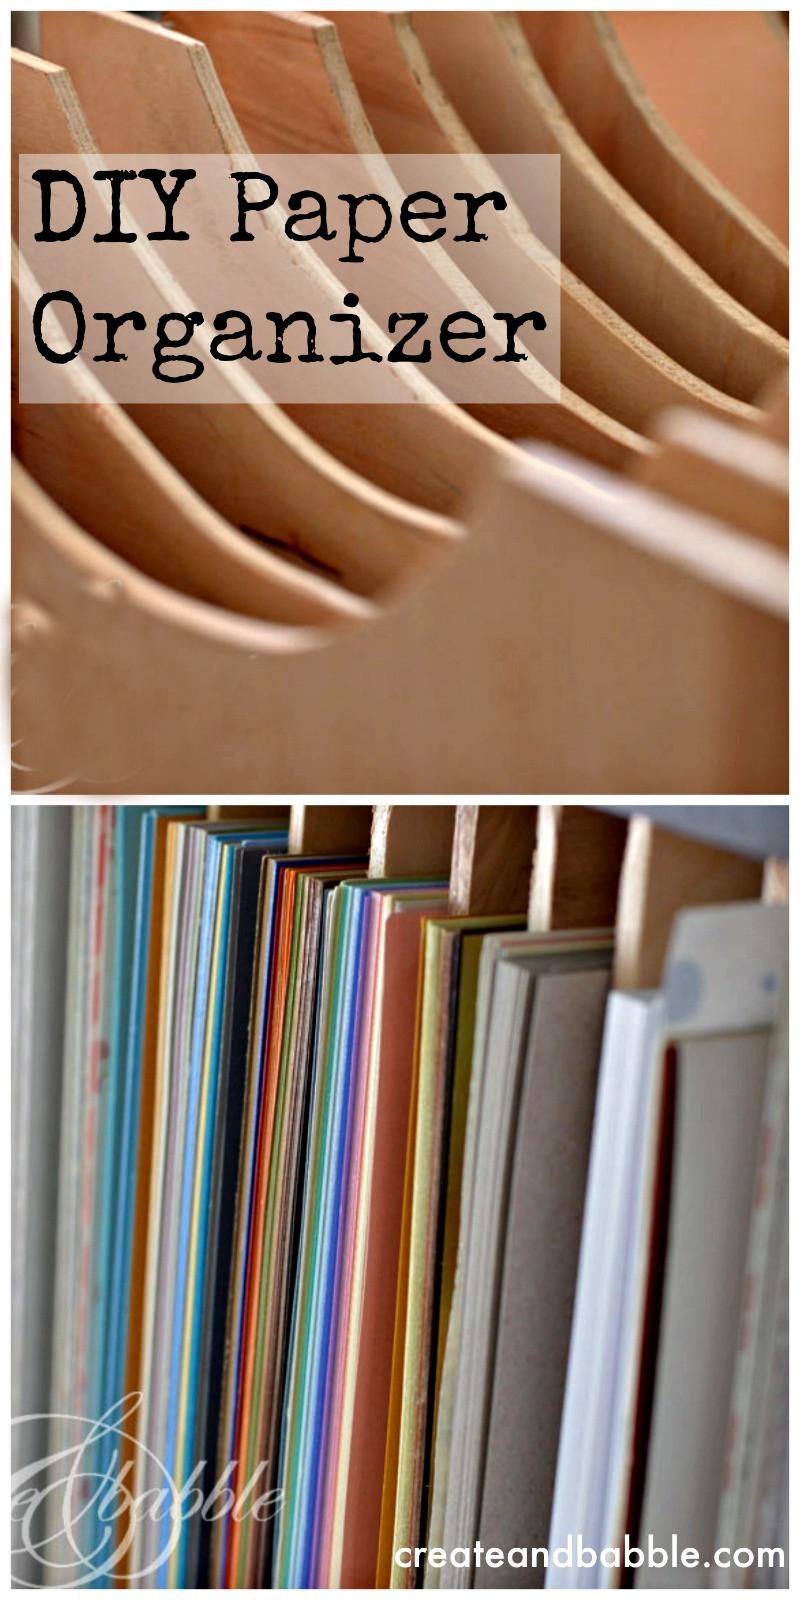 Best ideas about DIY Shelf Organizer . Save or Pin DIY Paper Organizer Someday Crafts Now.